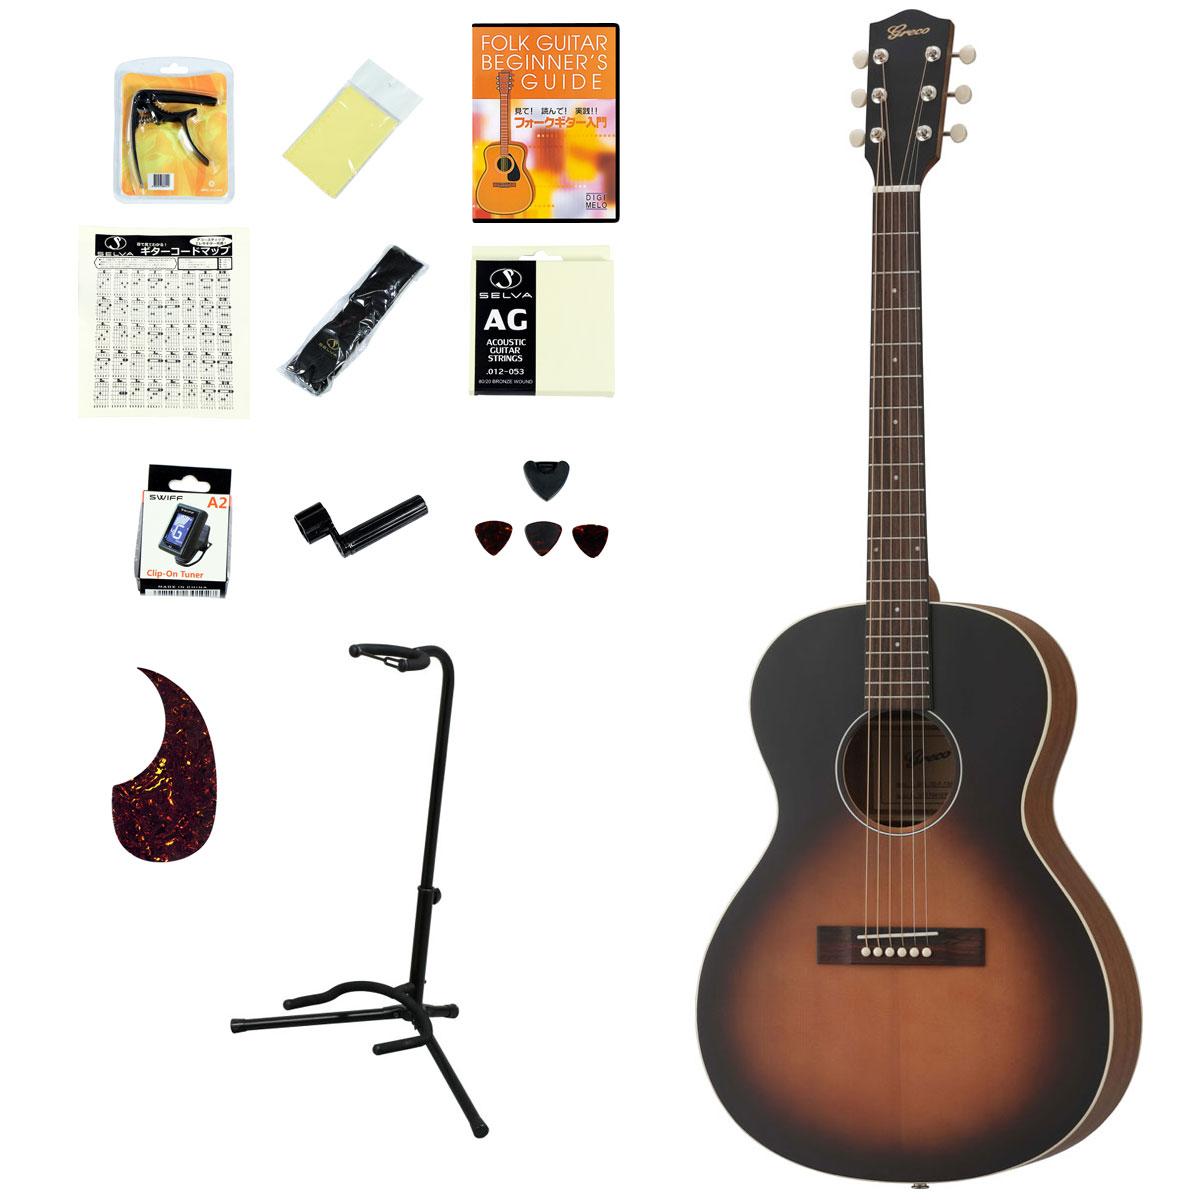 Greco / GAL-30P TSB (Tobacco Sunburst) 【アコースティックギター14点入門セット!】 グレコ アコースティックギター フォークギター アコギ 入門 初心者 GAL30P 【新品特価】